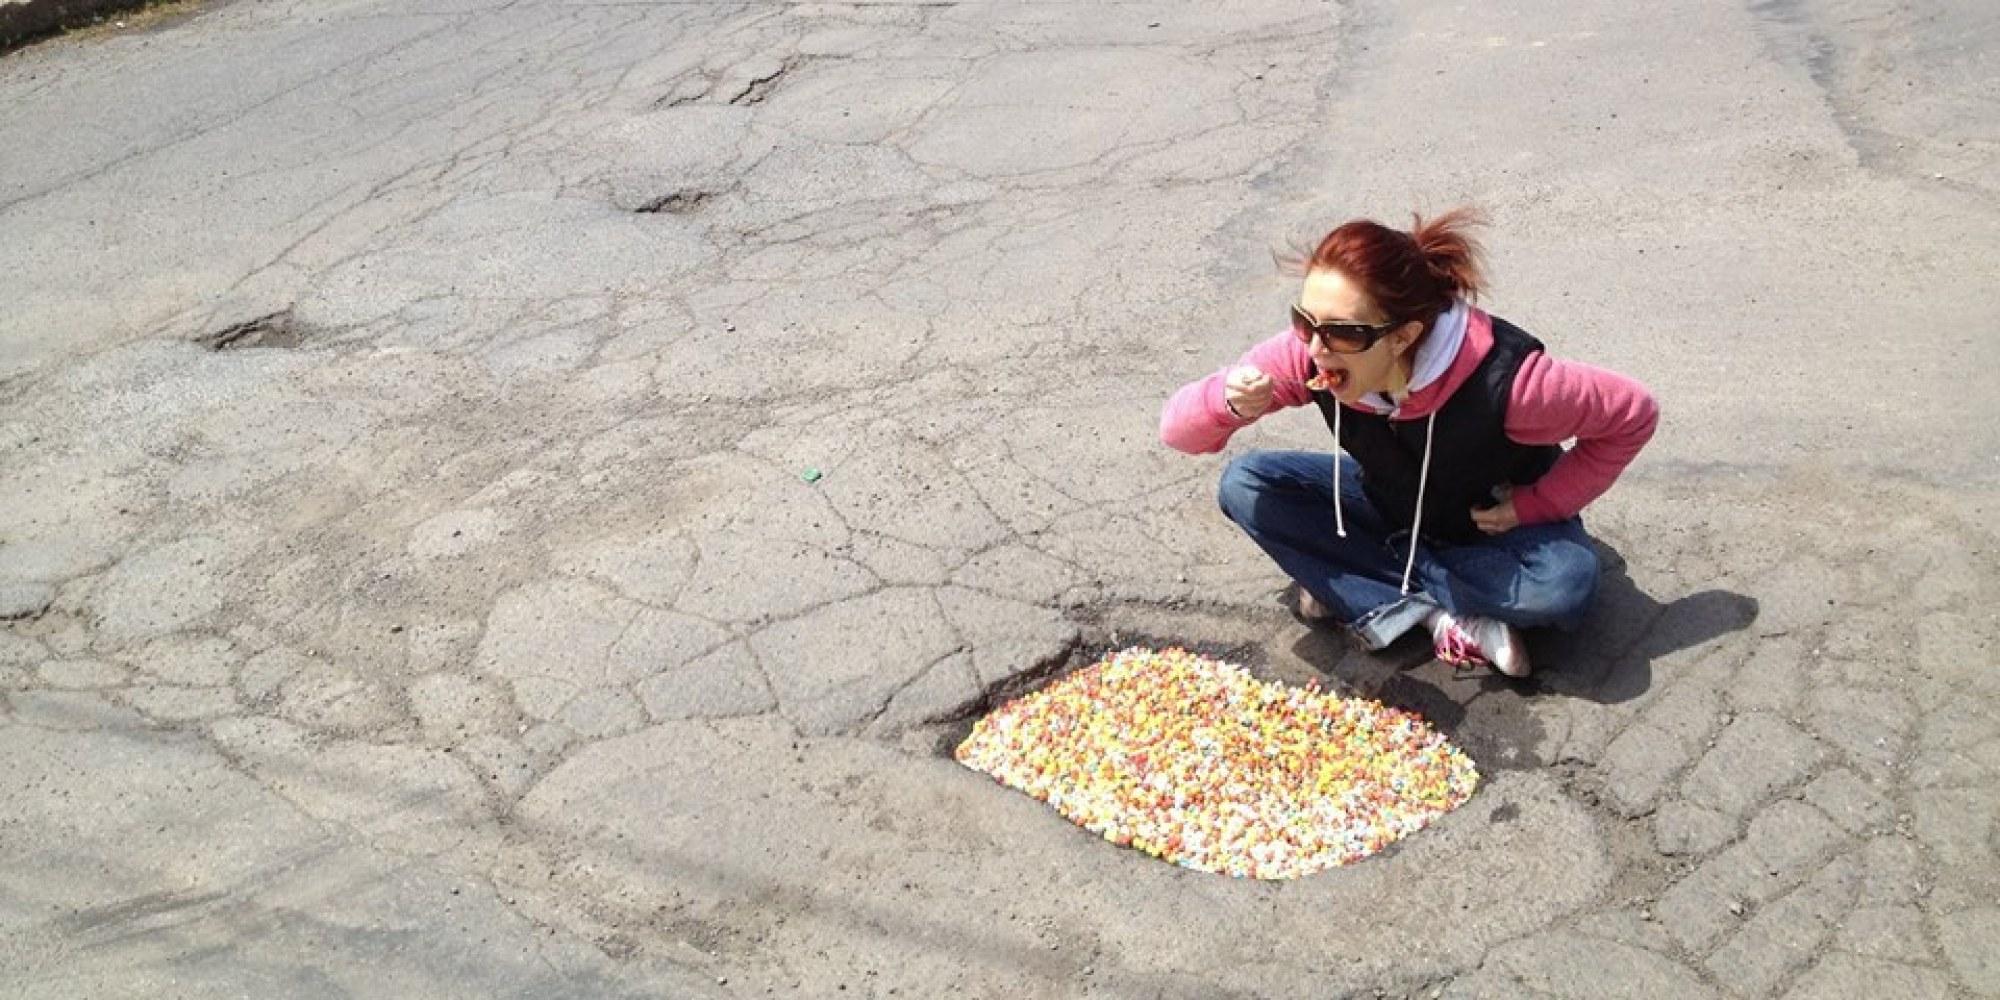 o-pothole-art-facebook.jpg